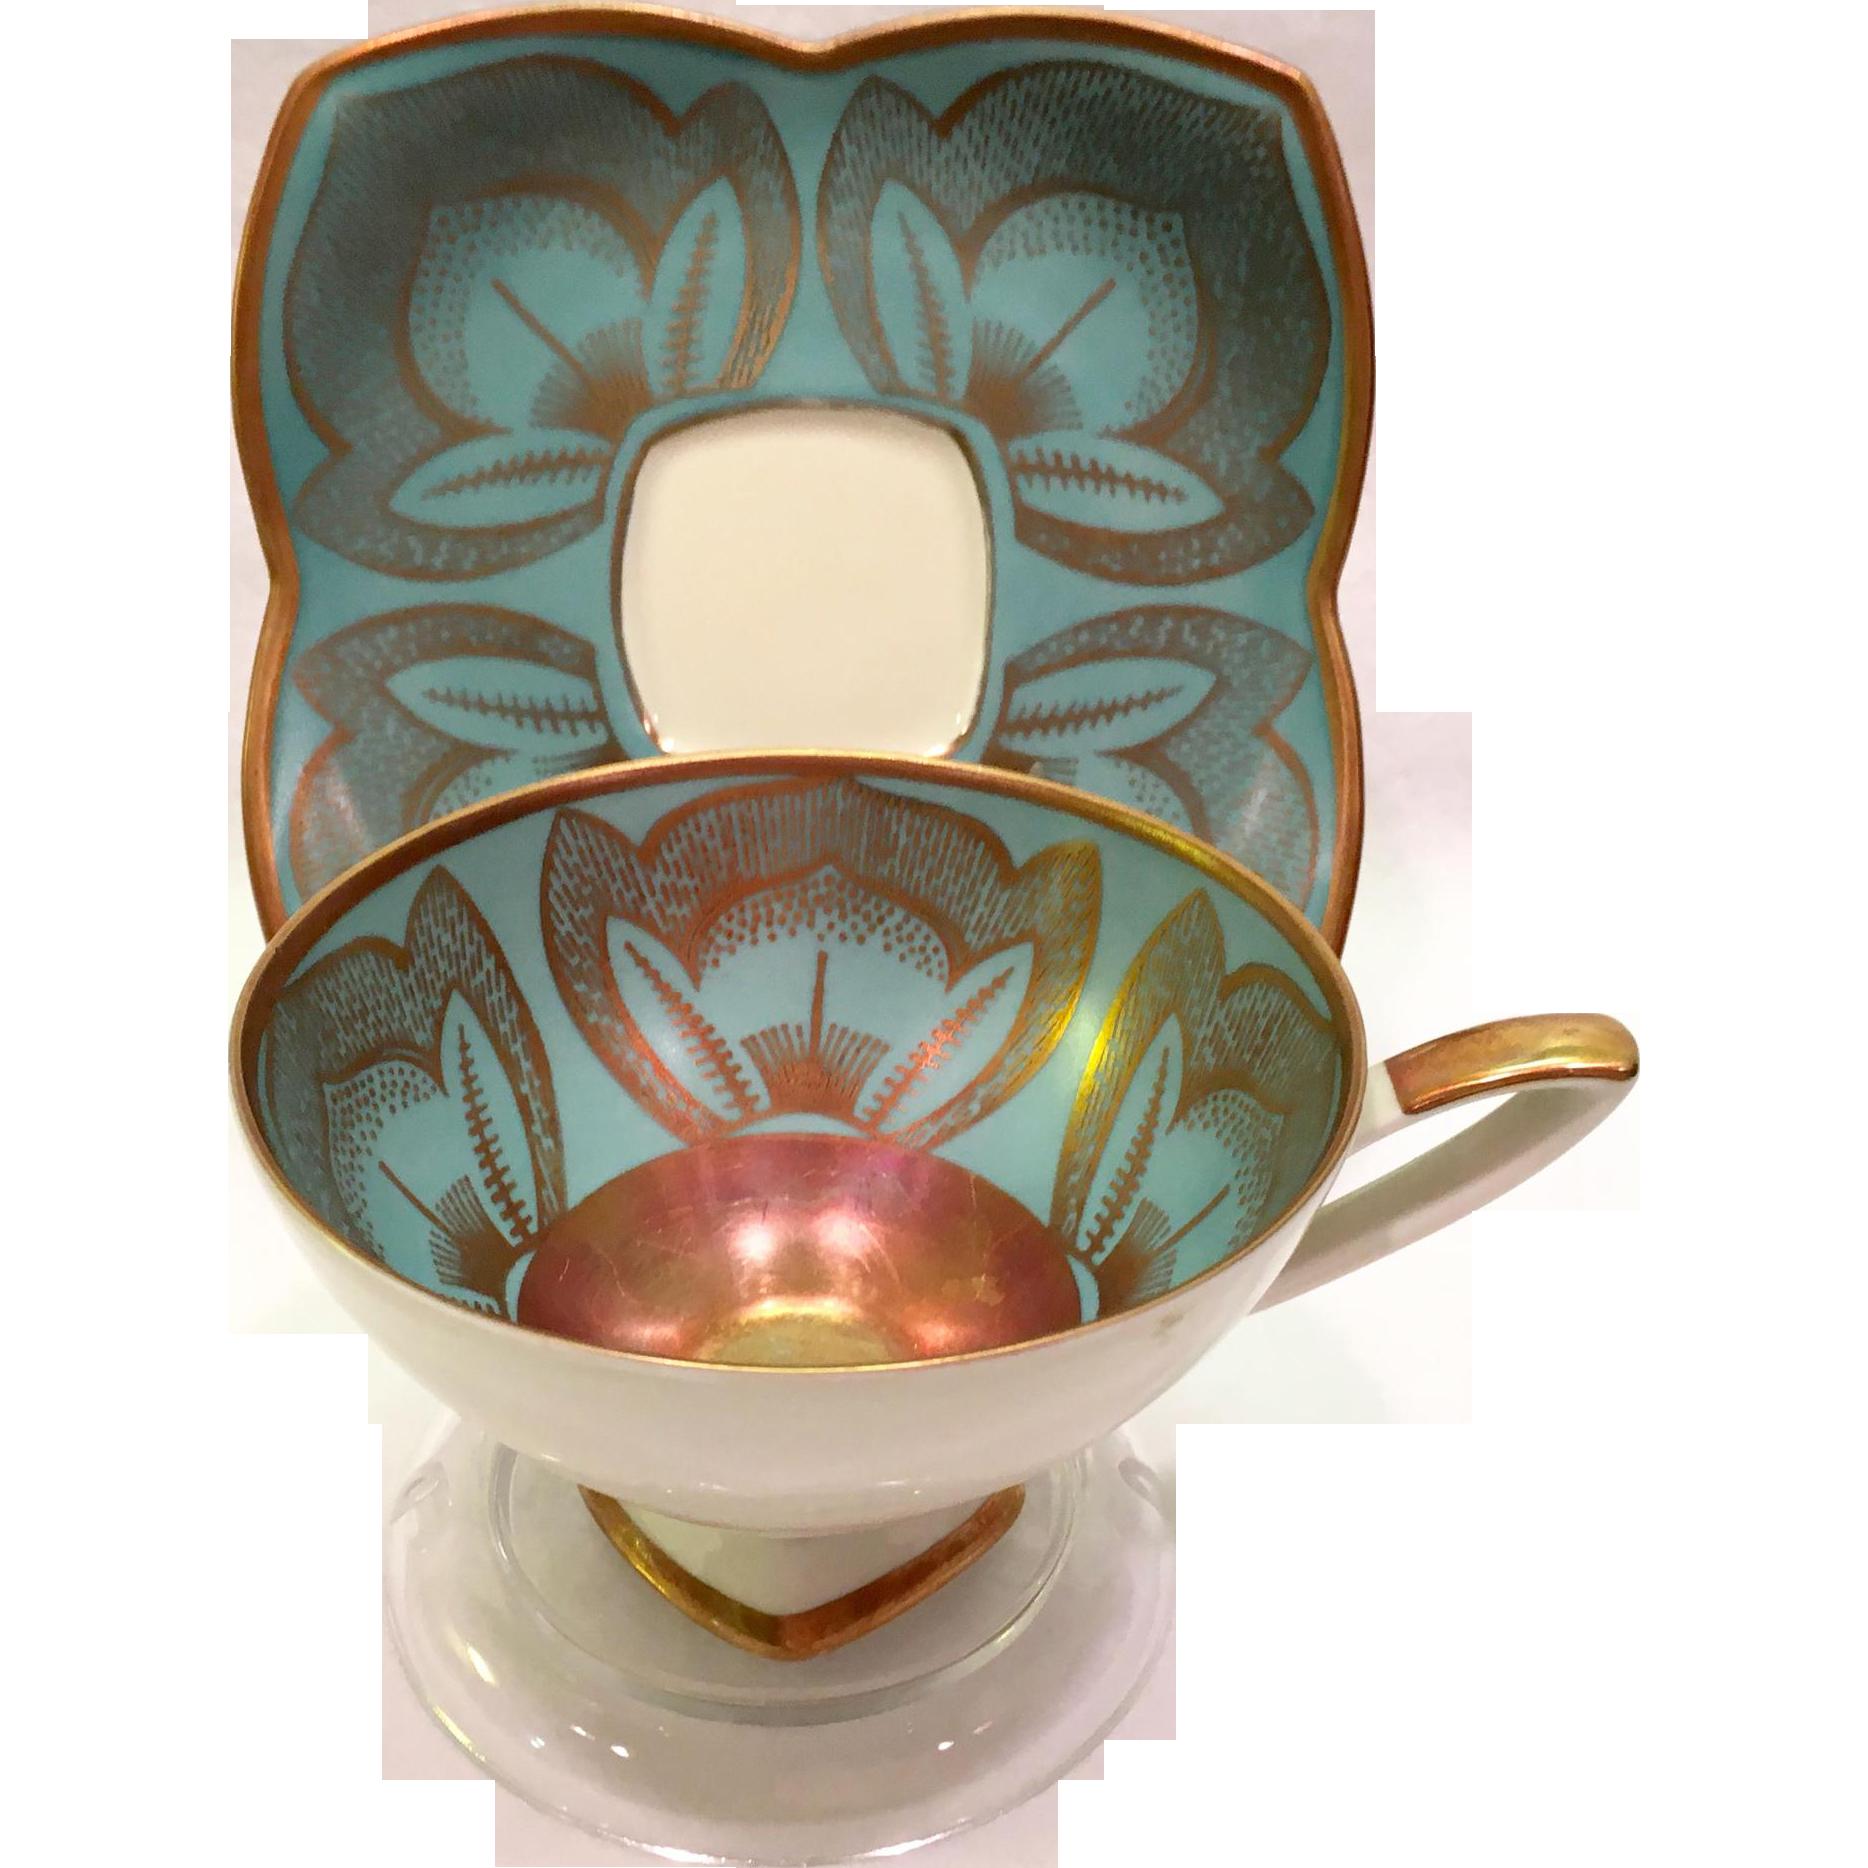 Alka west germany gold on blue 935 lotus flower teacup and saucer alka gold on blue lotus flower 935 teacup and saucer made in west germany izmirmasajfo